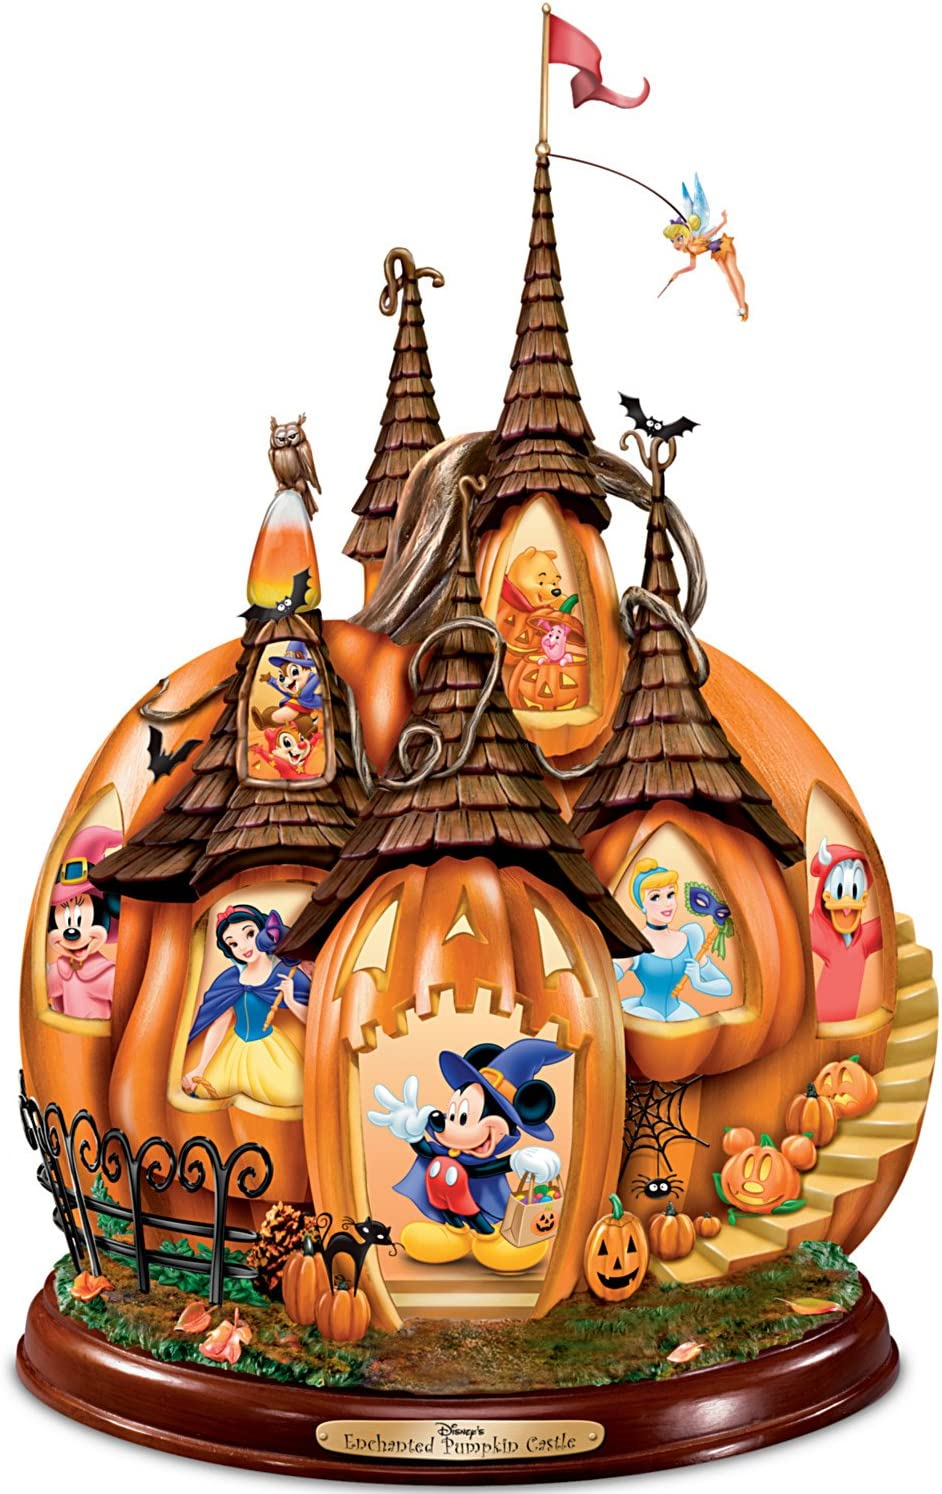 The Bradford Exchange Disney's Enchanted Pumpkin Castle Illuminated Halloween Sculpture